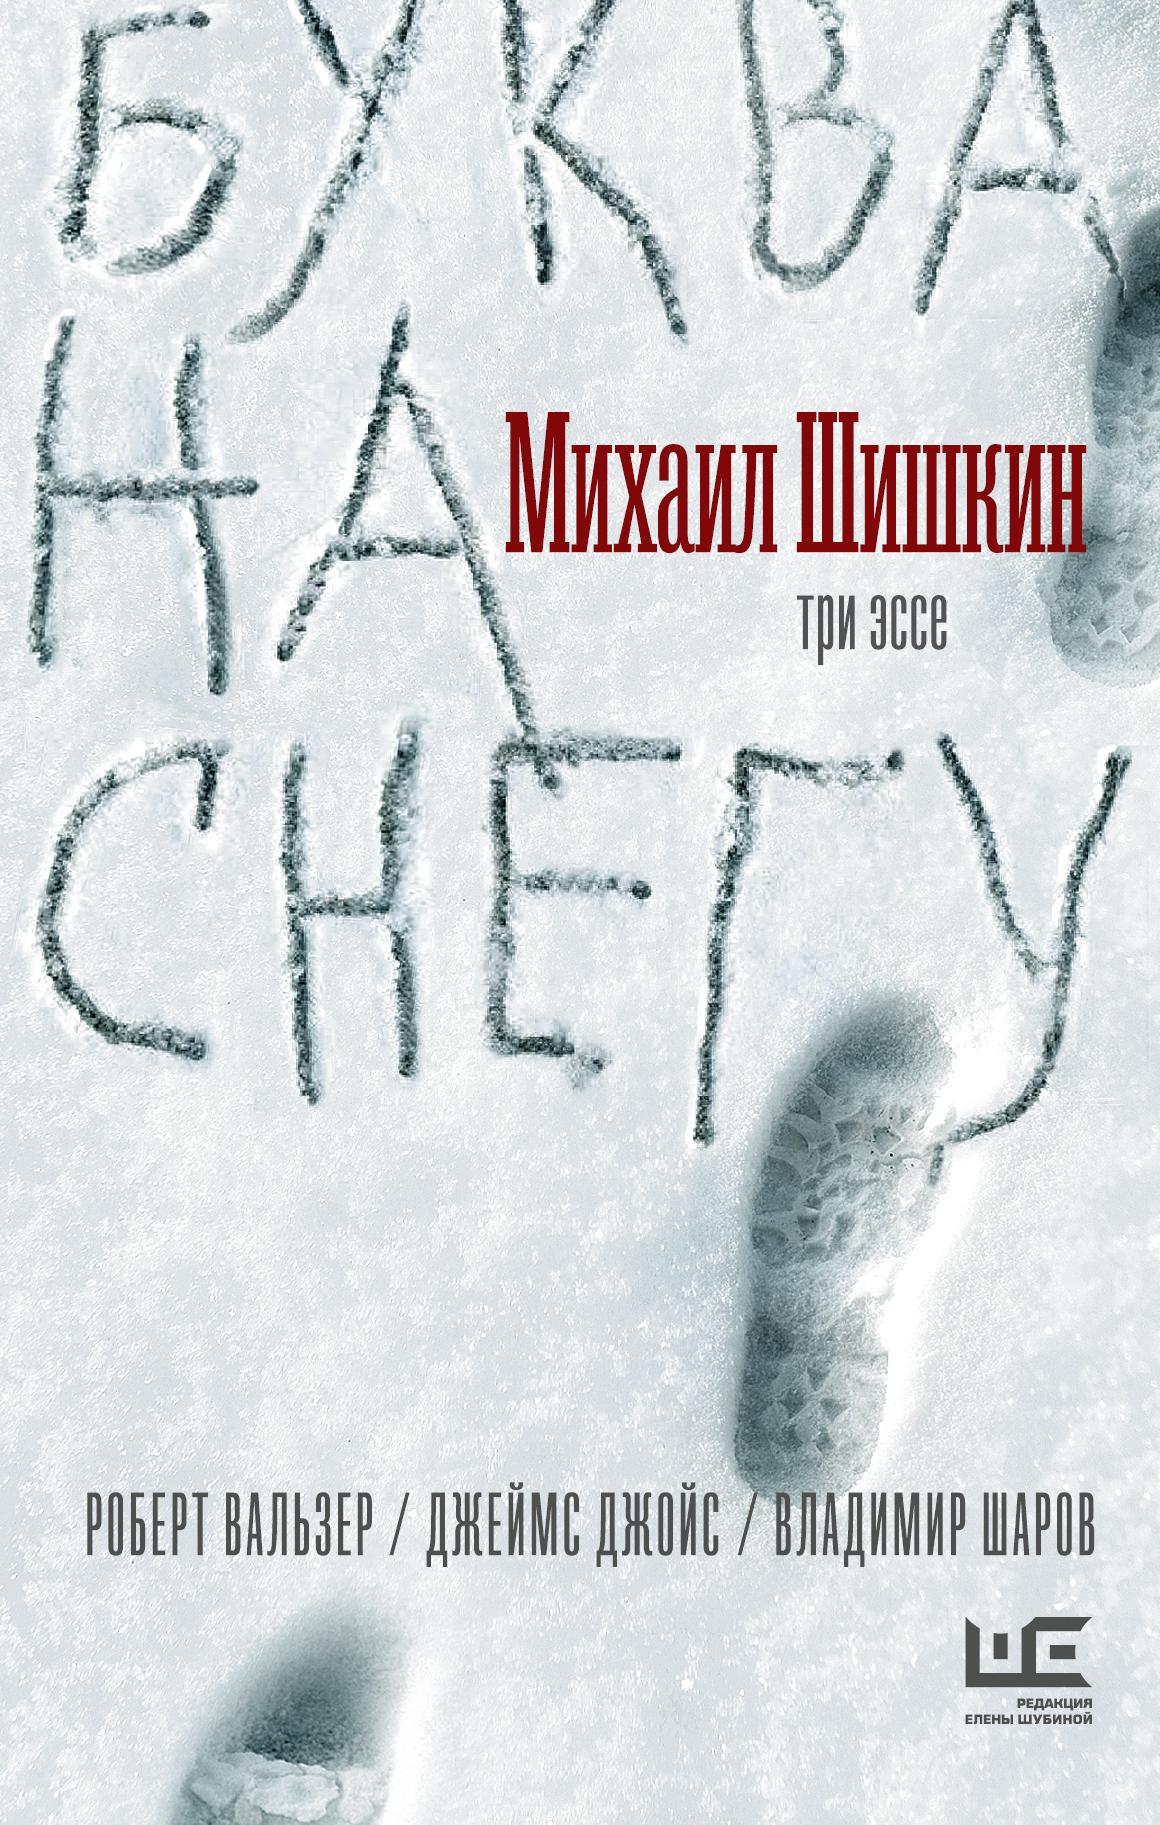 Михаил Шишкин. Буква на снегу